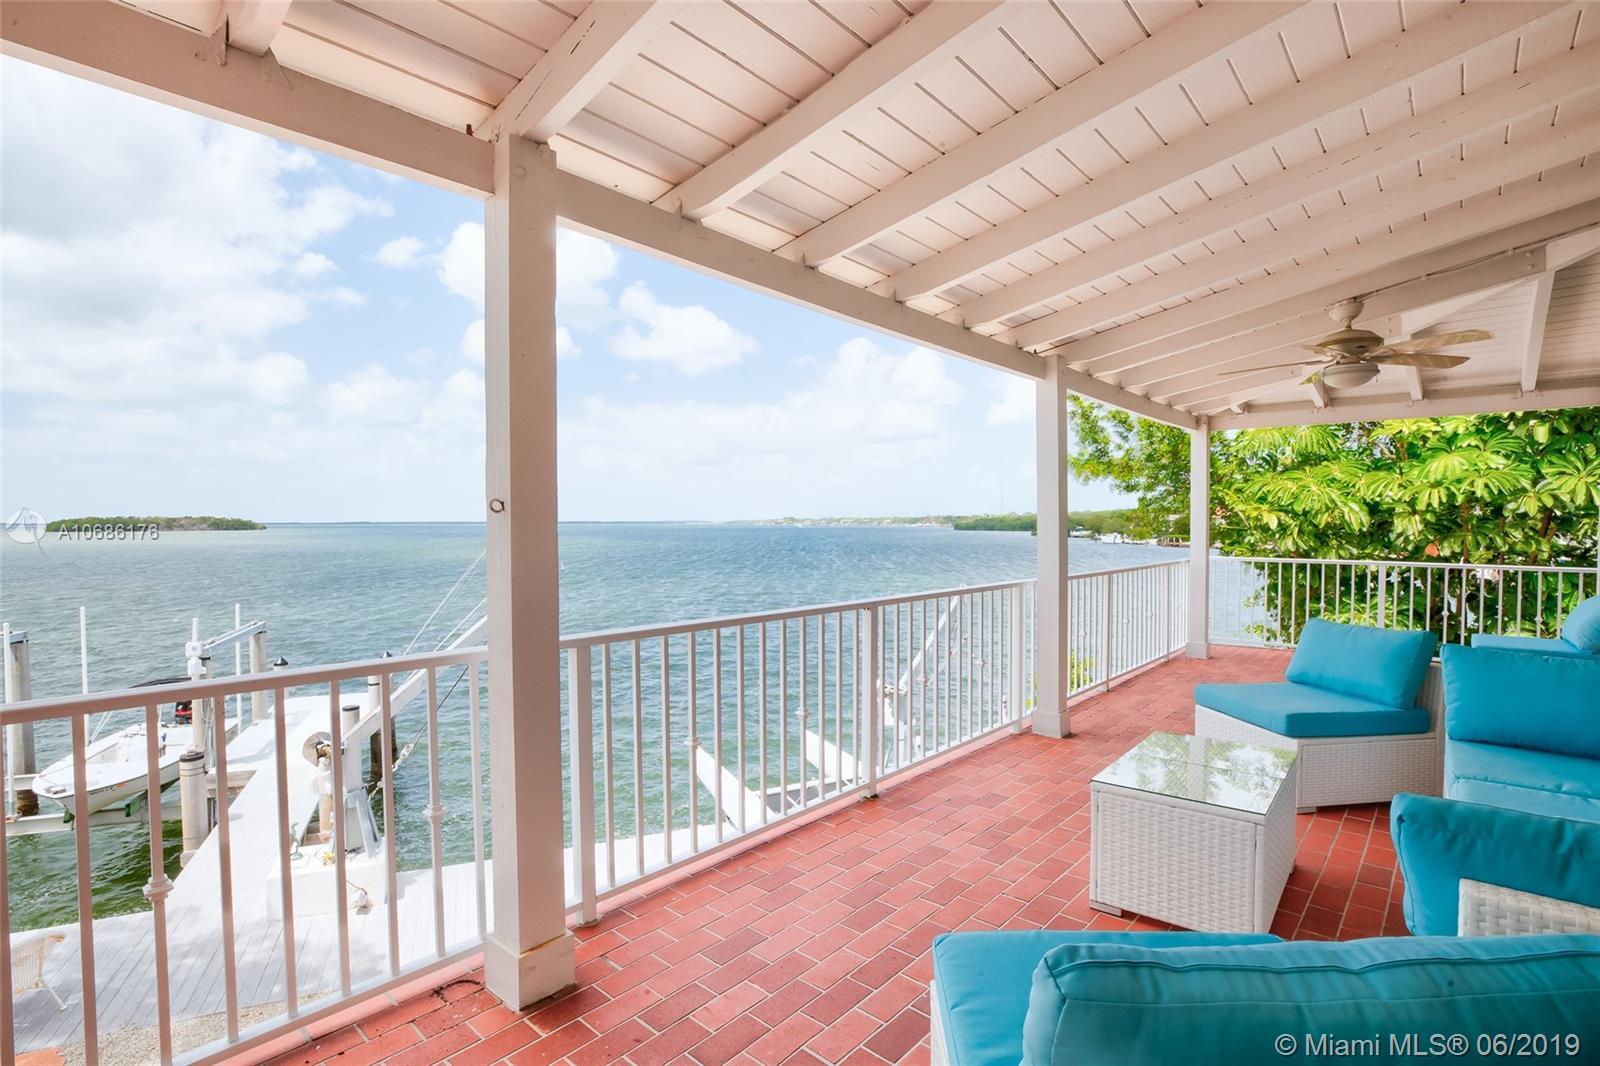 306 Jolly Roger Dr, Other City - Keys/Islands/Caribb, FL 33037 - Other City - Keys/Islands/Caribb, FL real estate listing